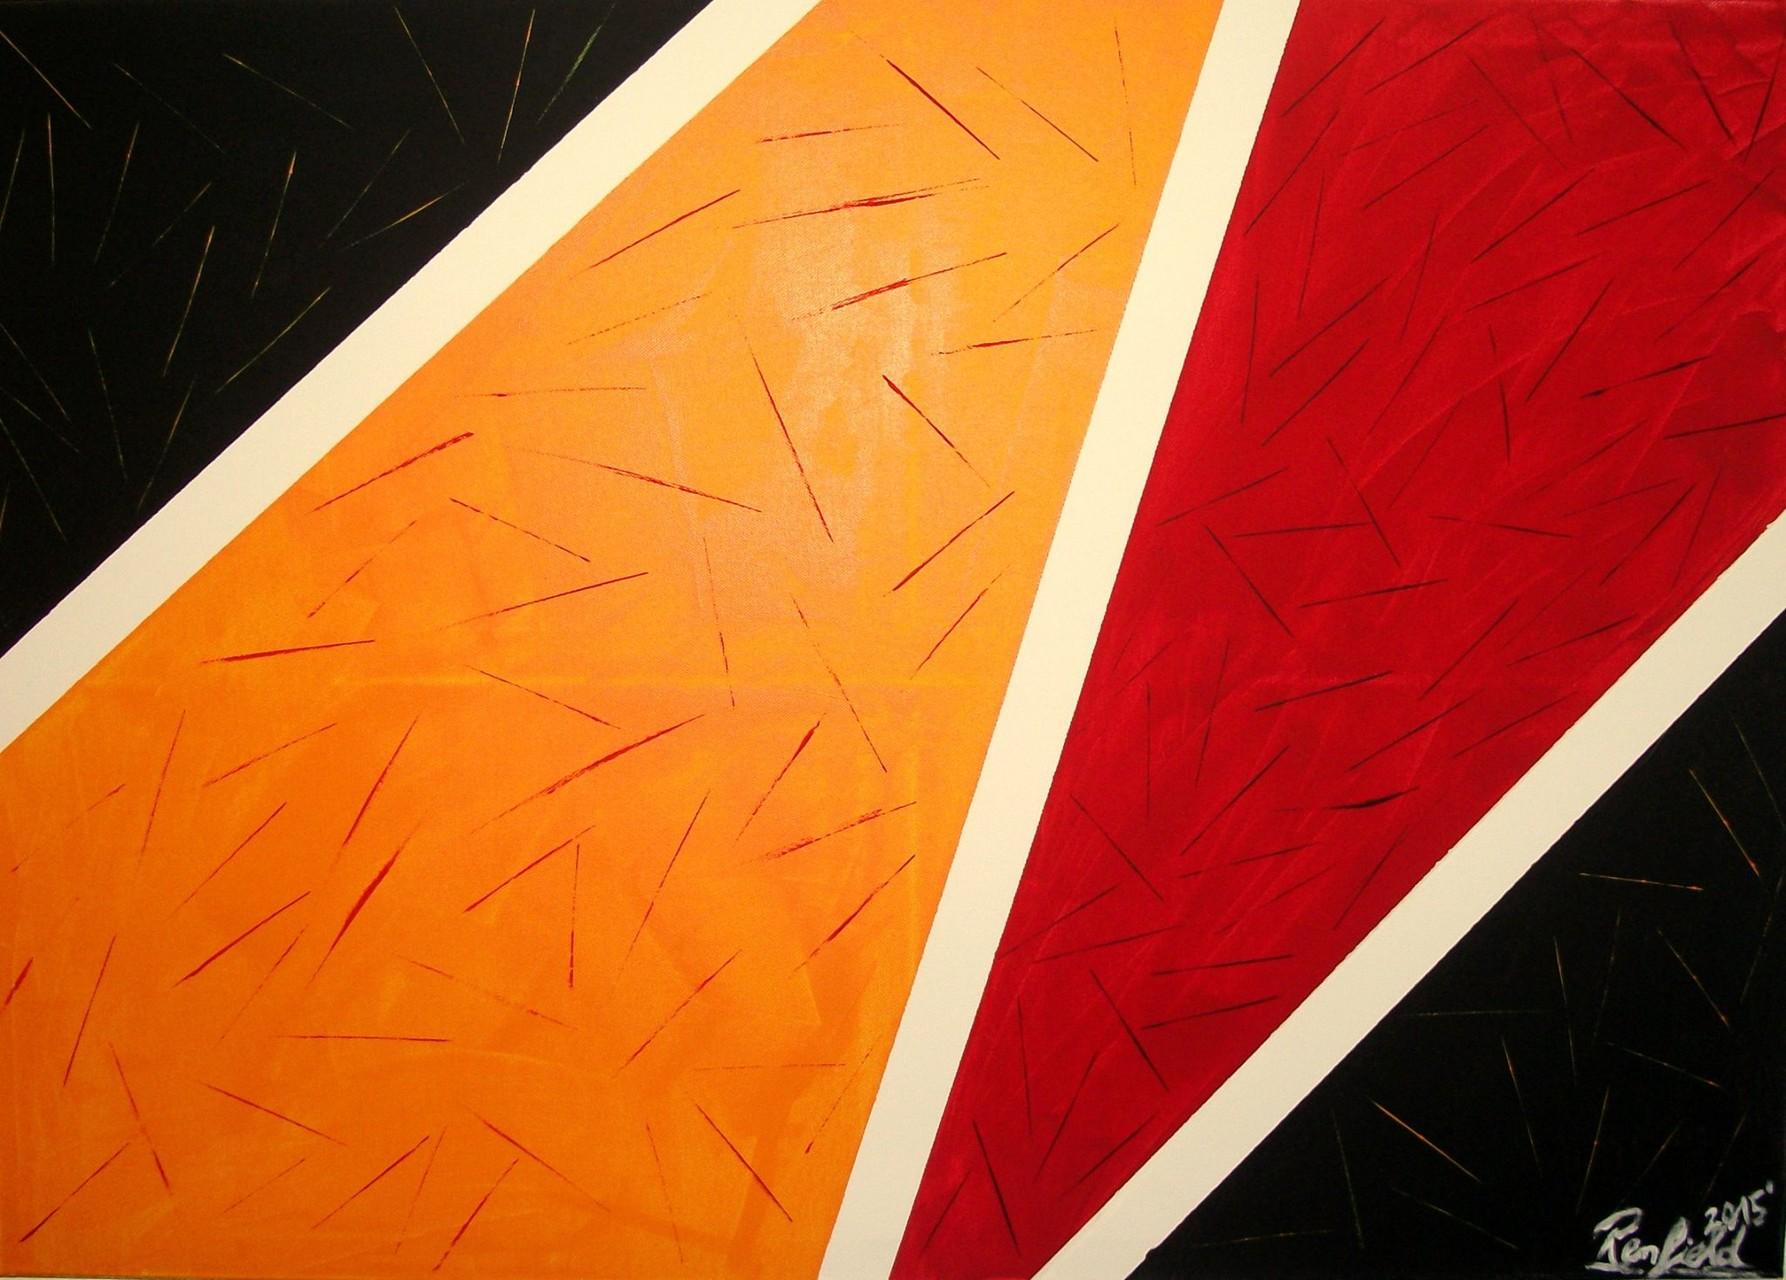 Colors 8 (100 x 70) Acryl und Struktur auf Leinwand Kaufpreis 250 €uro